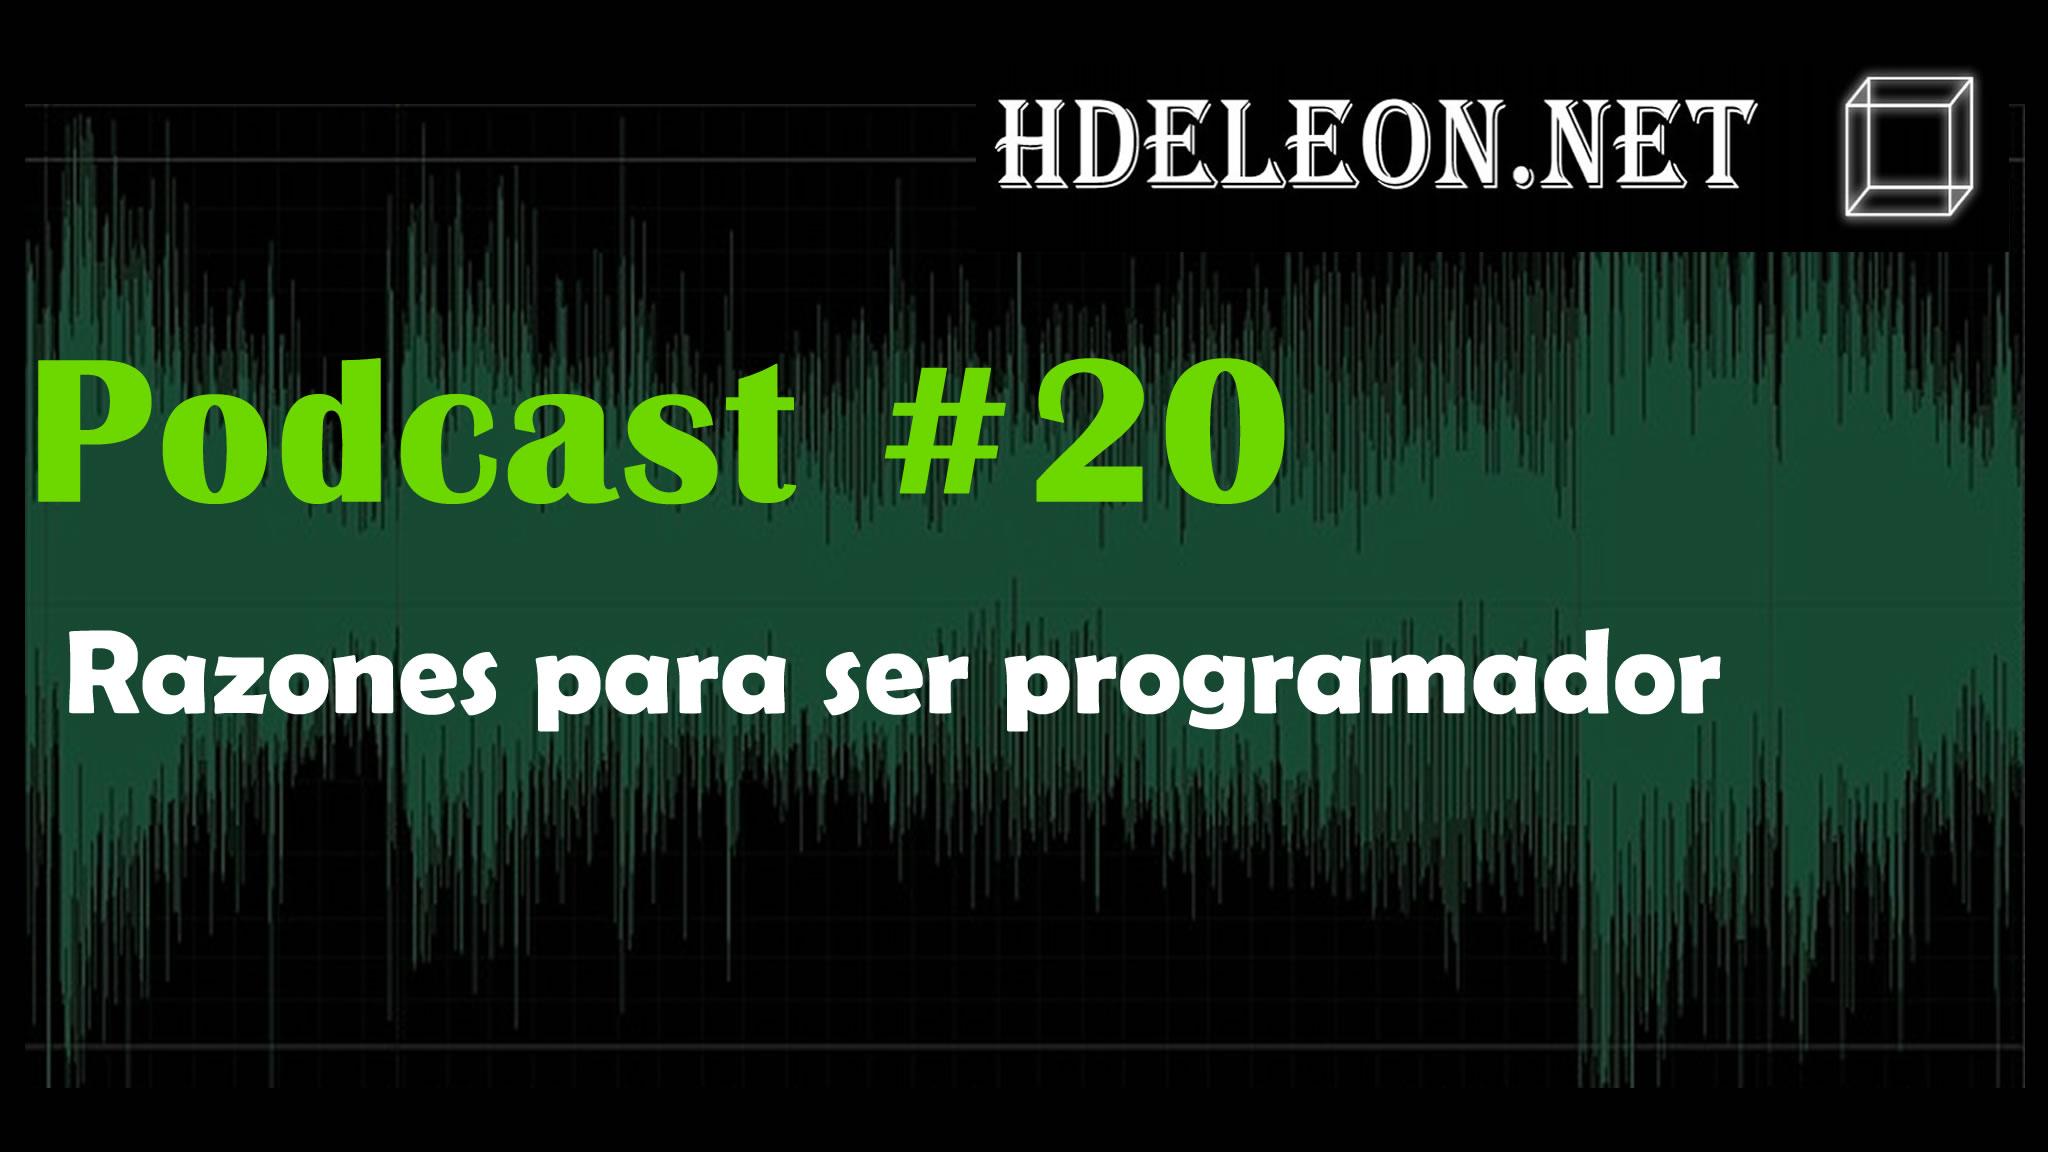 Podcast #20 – Razones para ser programador